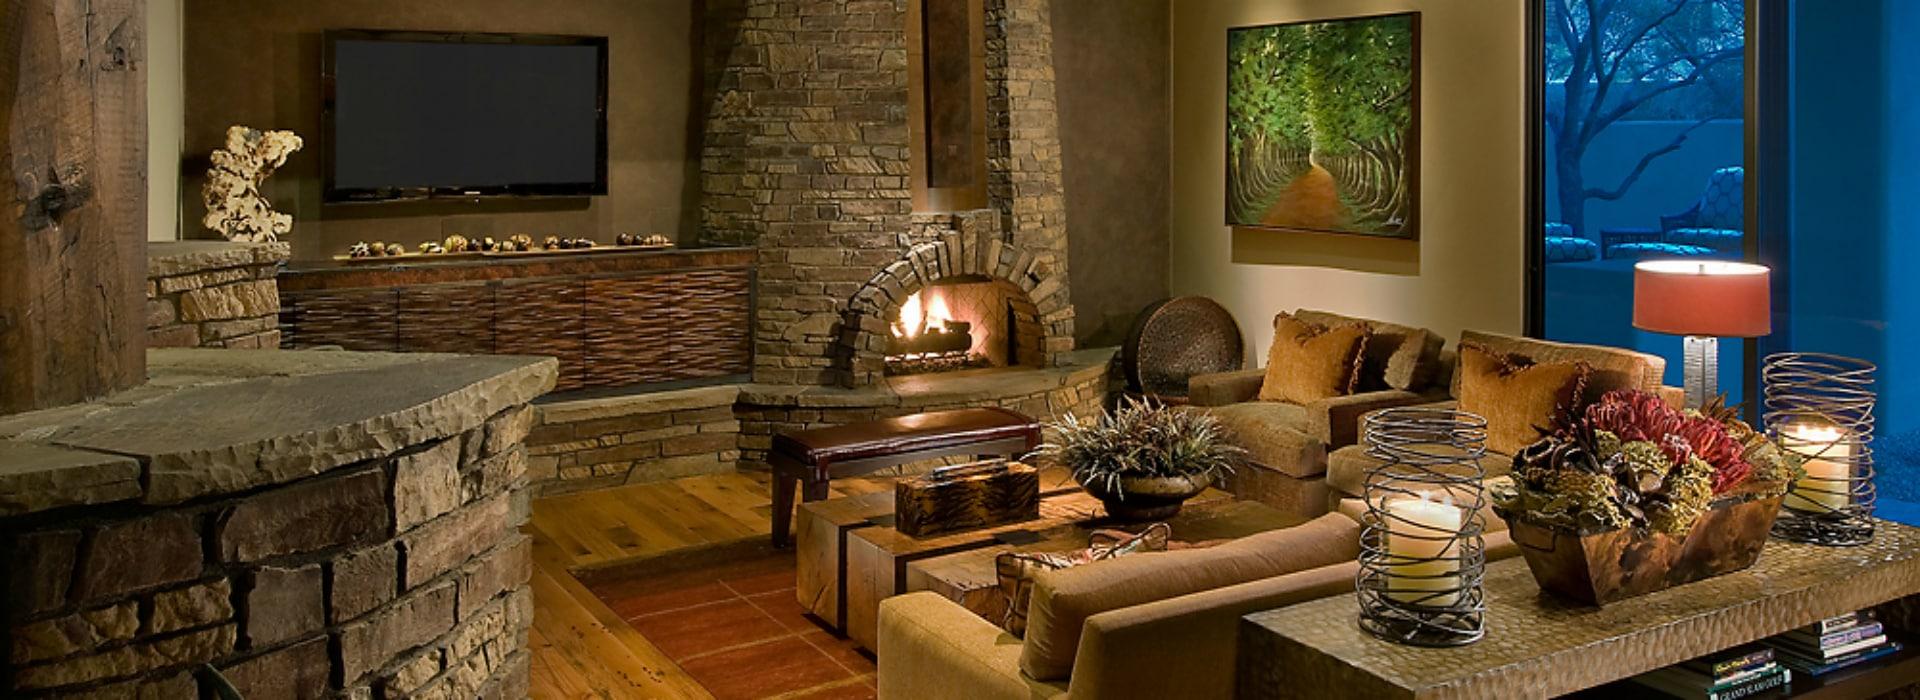 Scottsdale interior design firm phoenix interior design for Scottsdale architecture firms